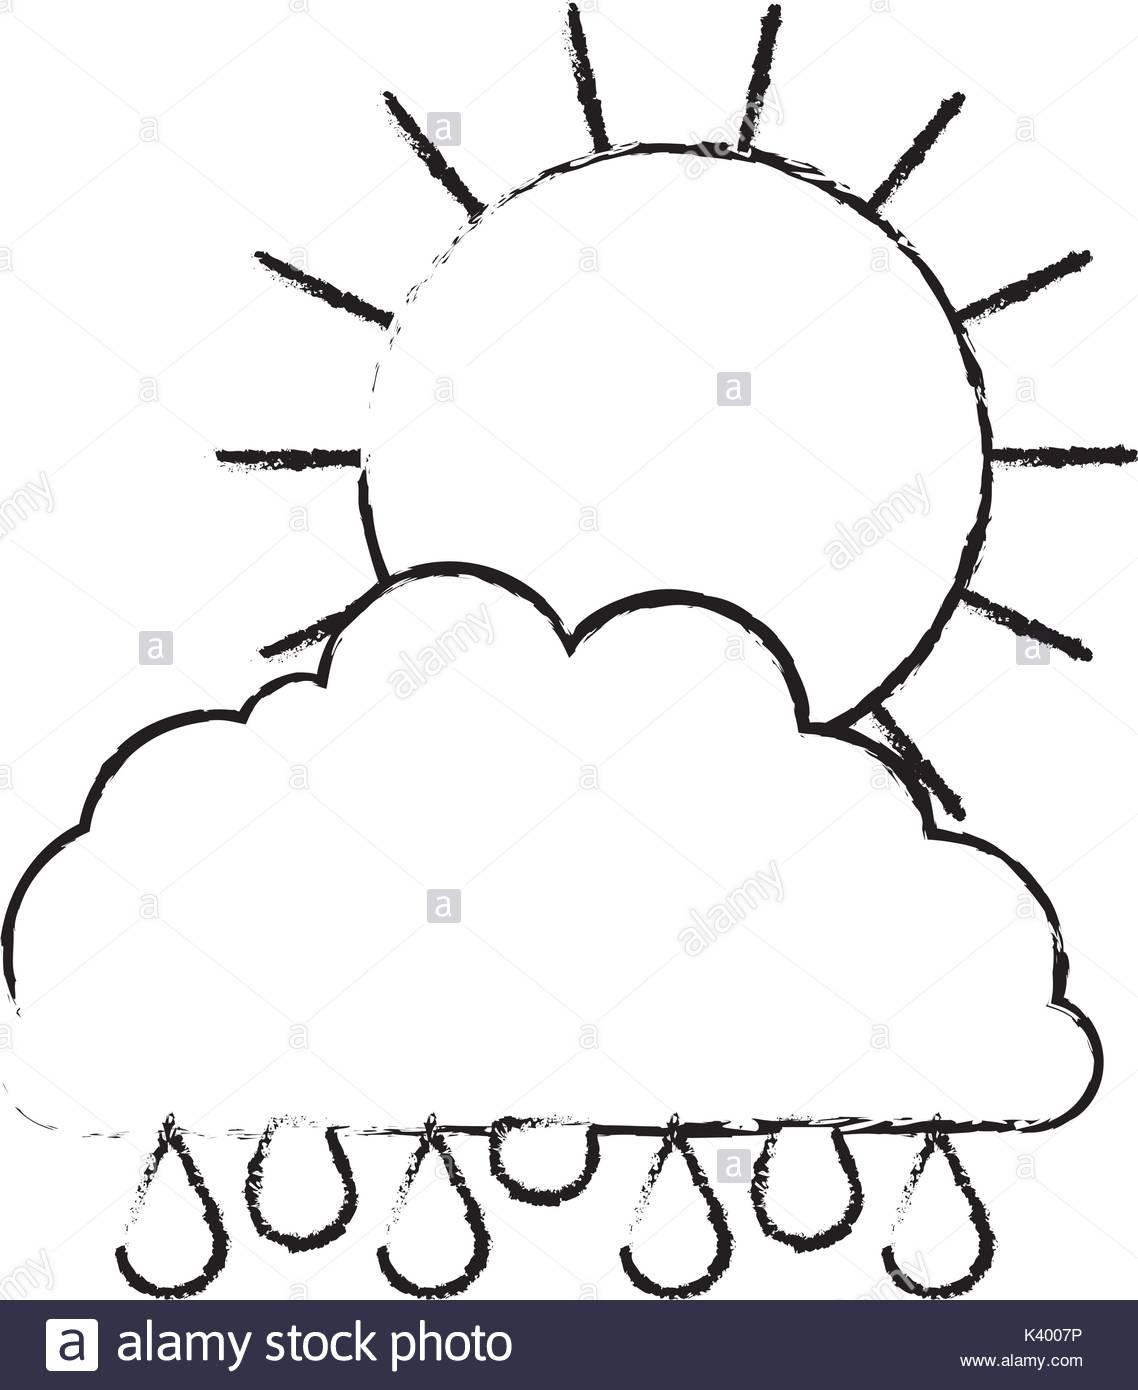 1138x1390 Sun And Cloud With Drops Rain In Monochrome Blurred Silhouette